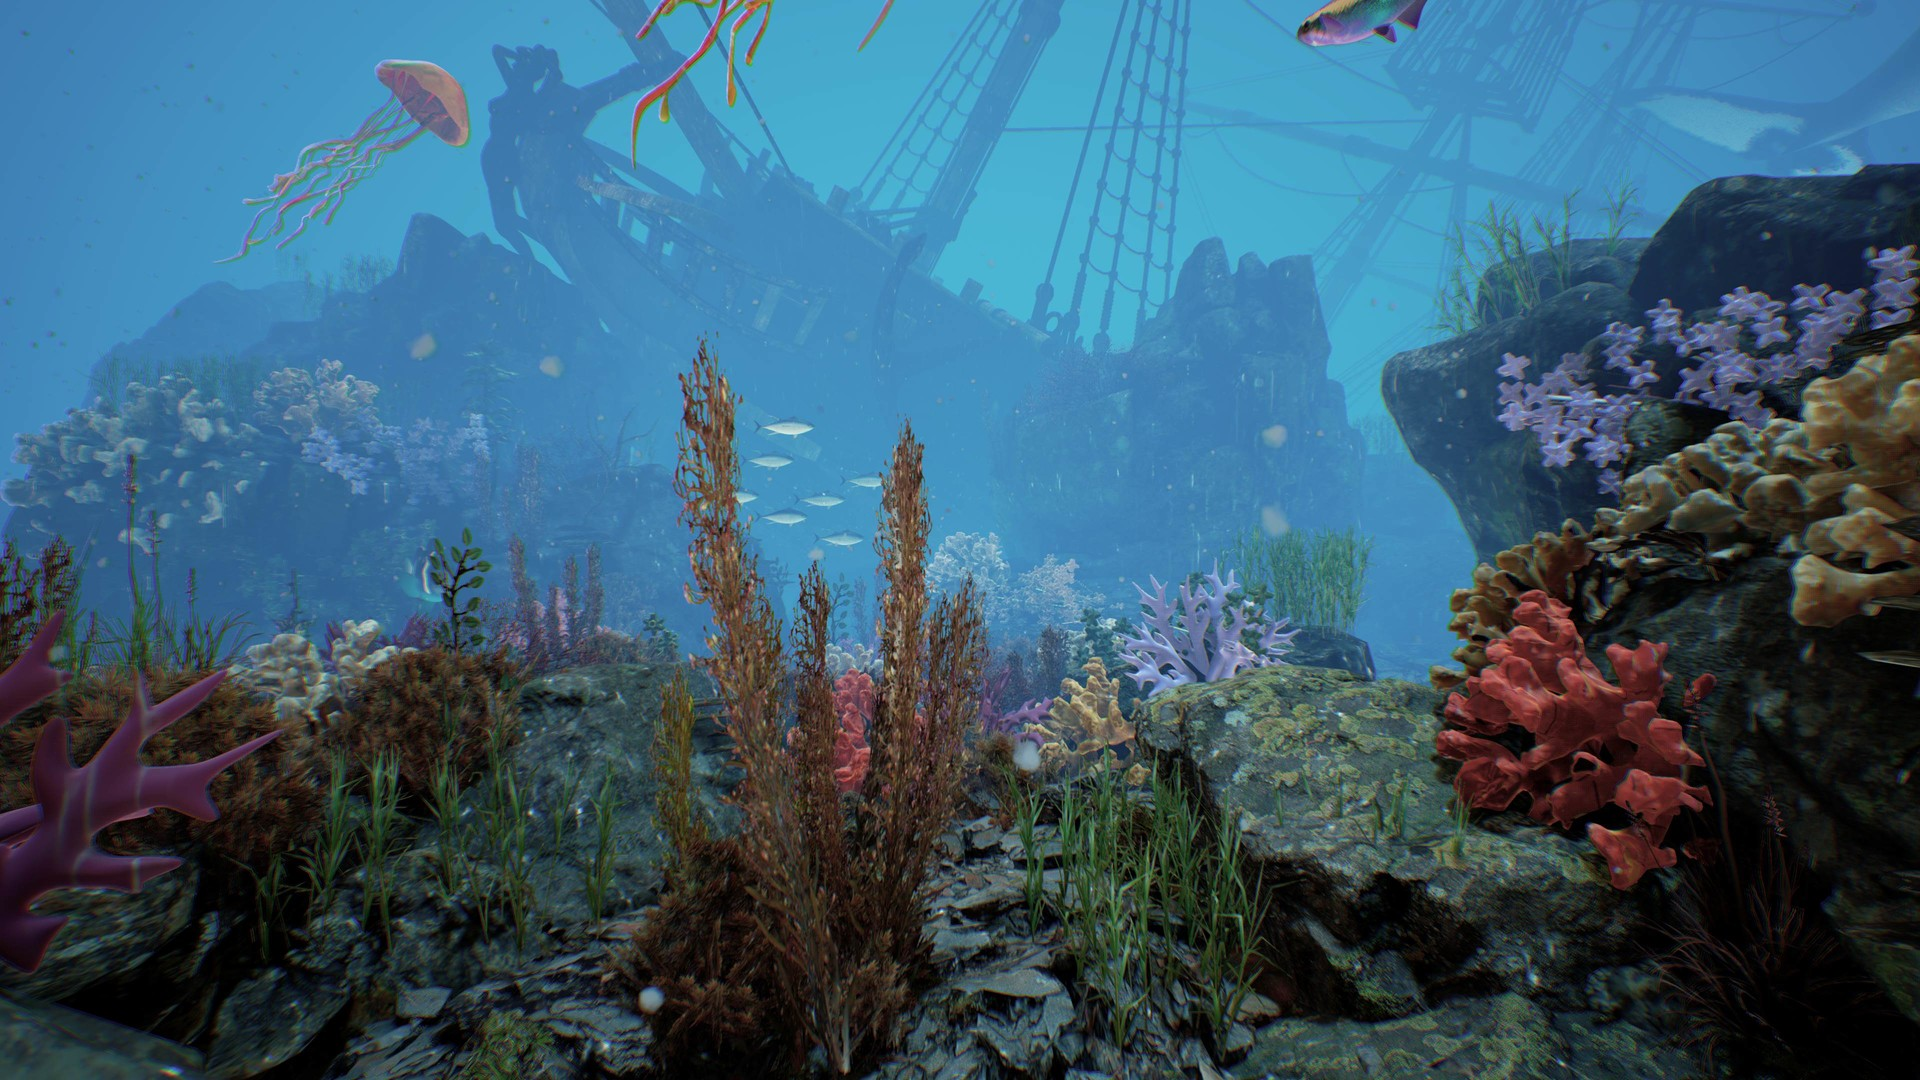 Underwater scene 4